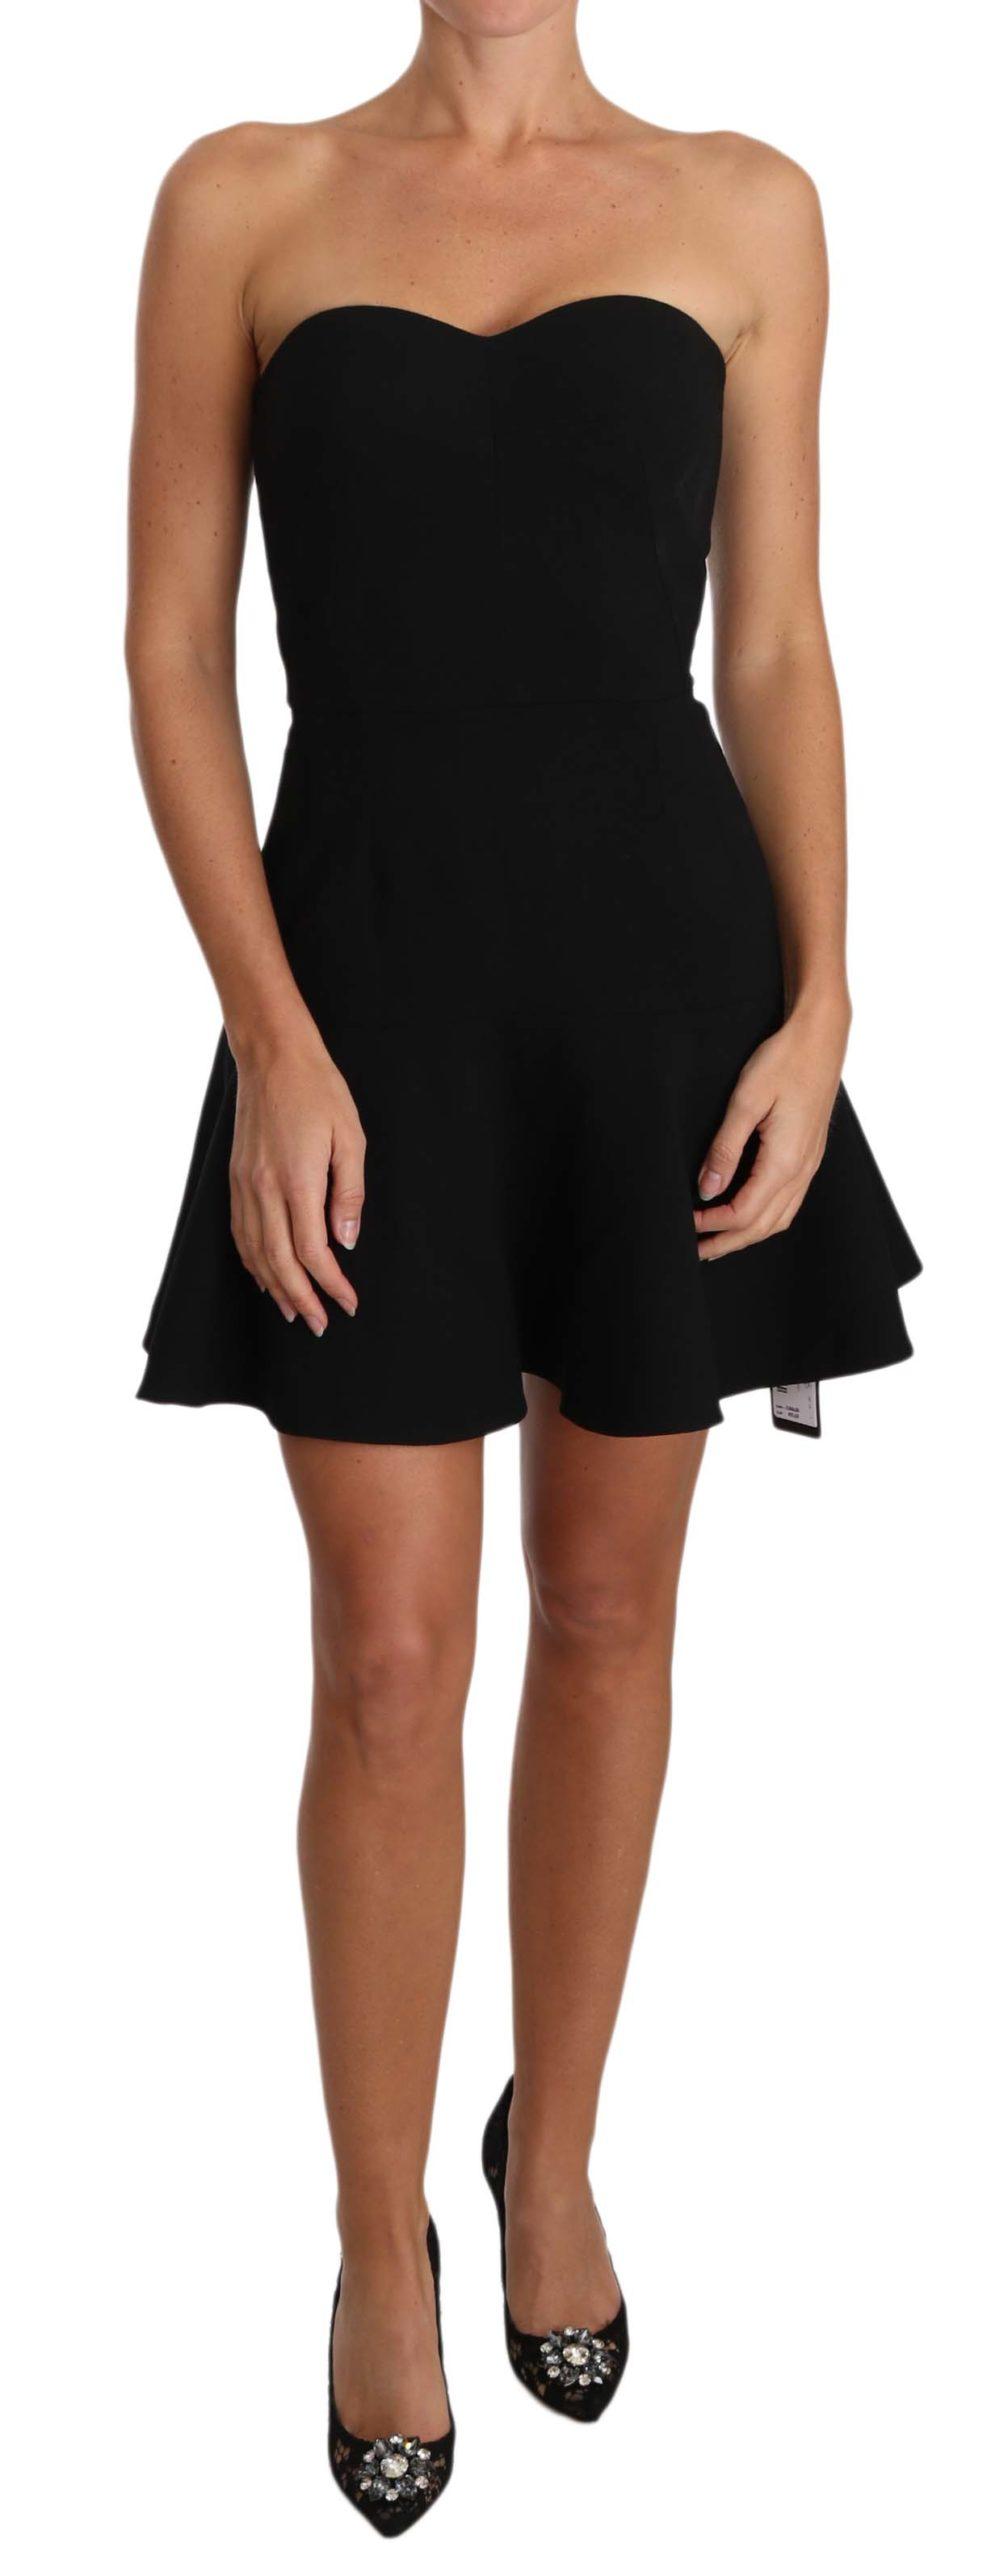 Dolce & Gabbana Women's Wool Stretch A-Line Cocktail Dress Black DR2028 - IT38|XS